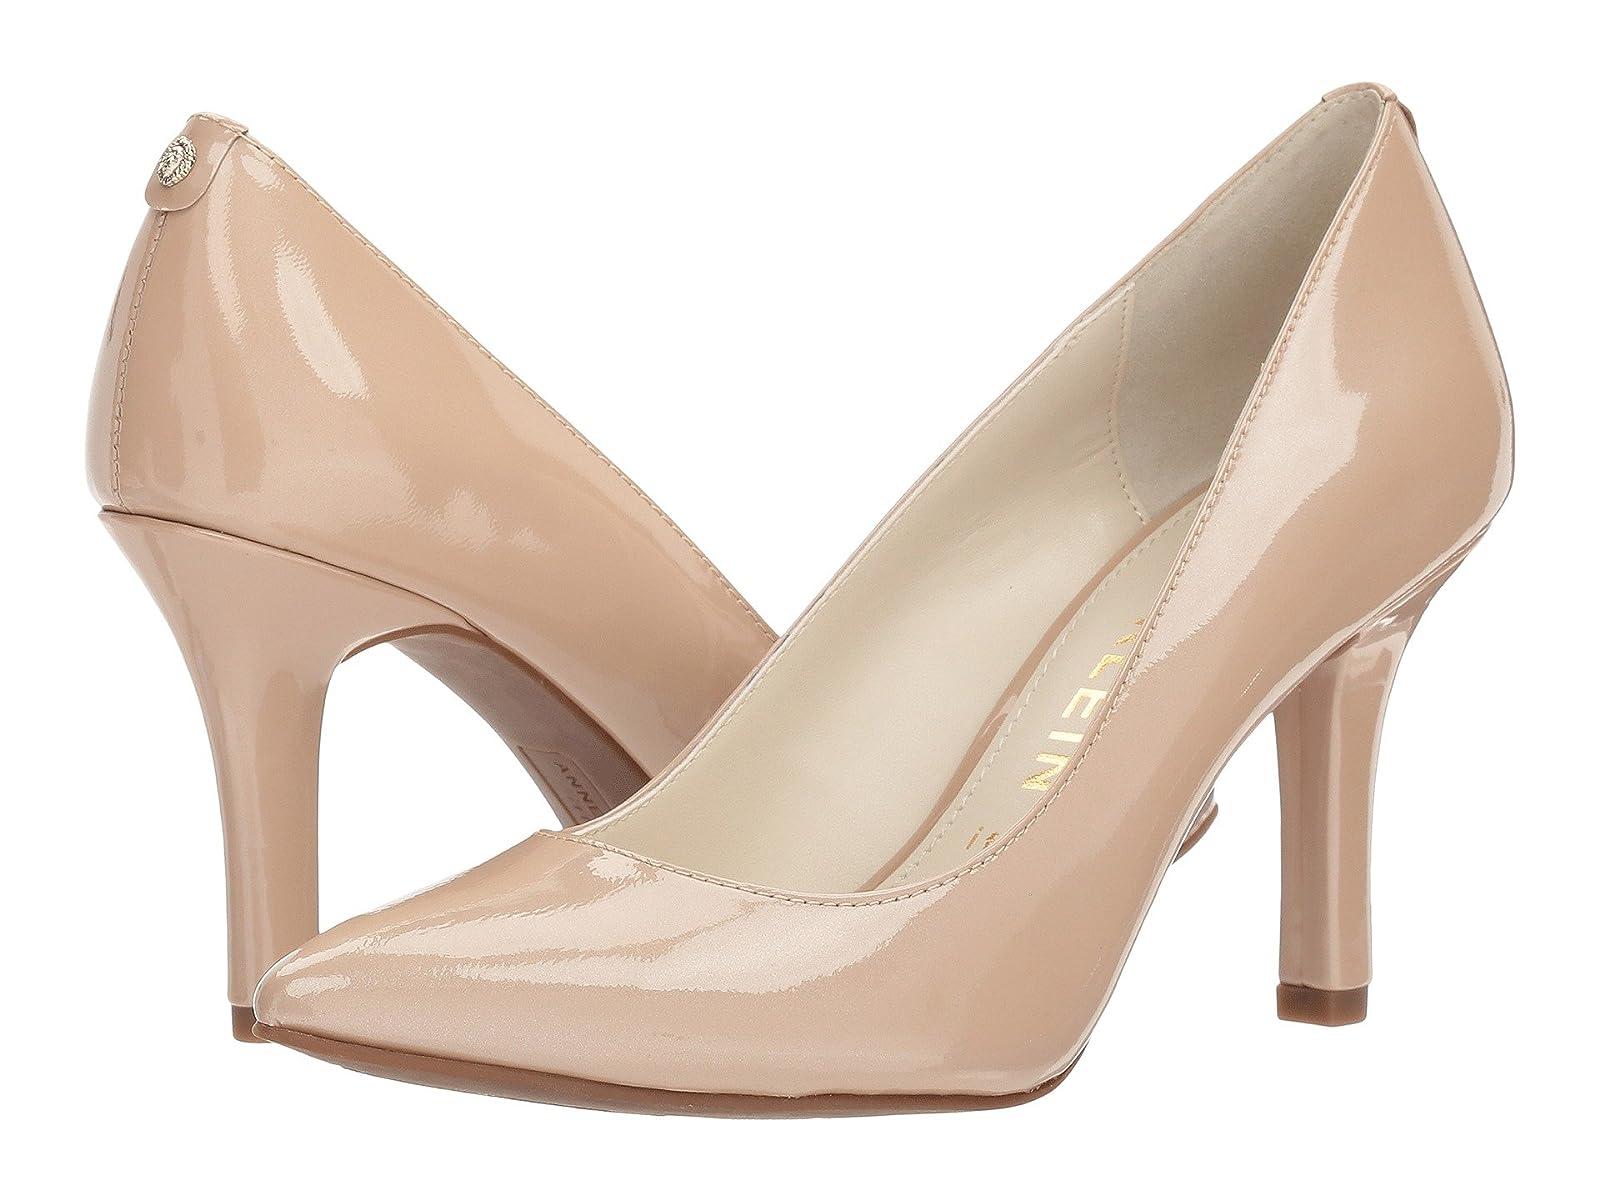 Anne Klein FaelynAtmospheric grades have affordable shoes